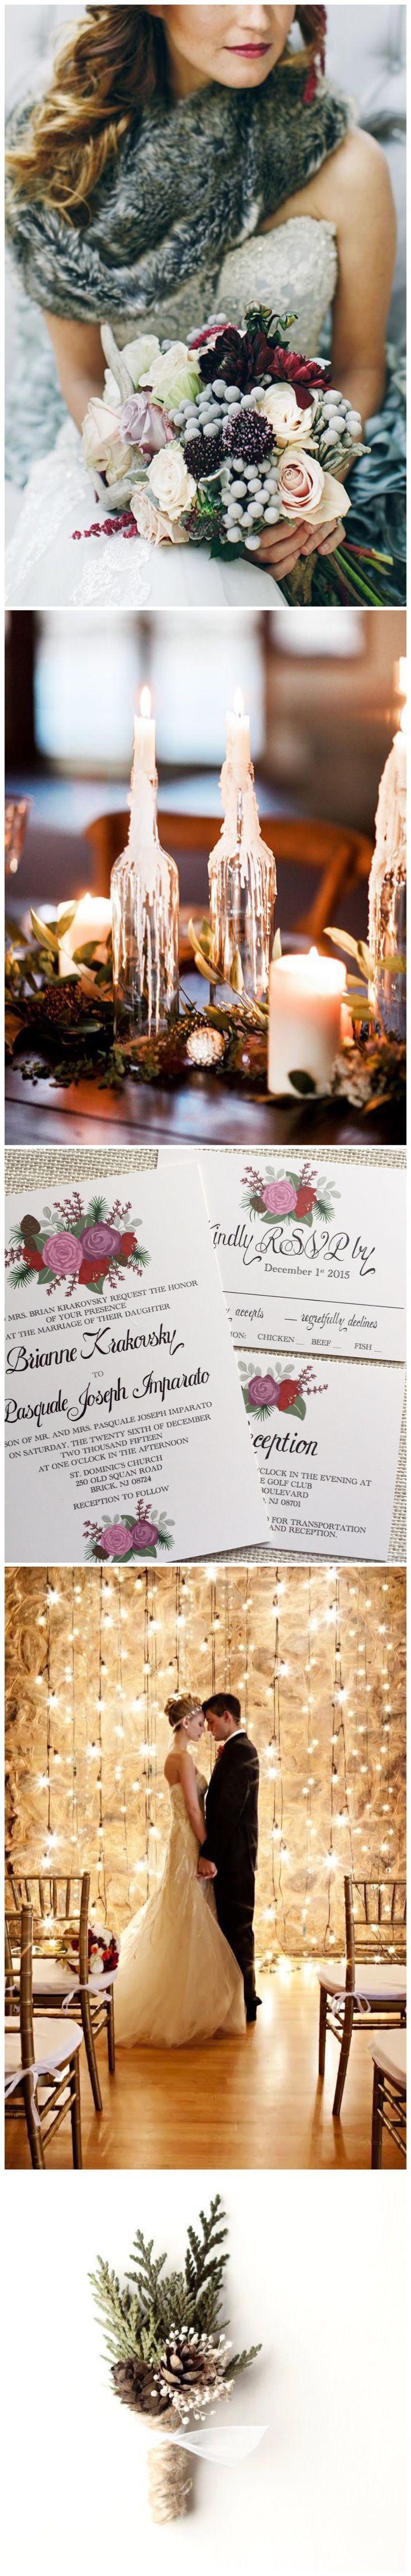 84 Best Wedding Invitations Images By Meranda Townsend On Pinterest